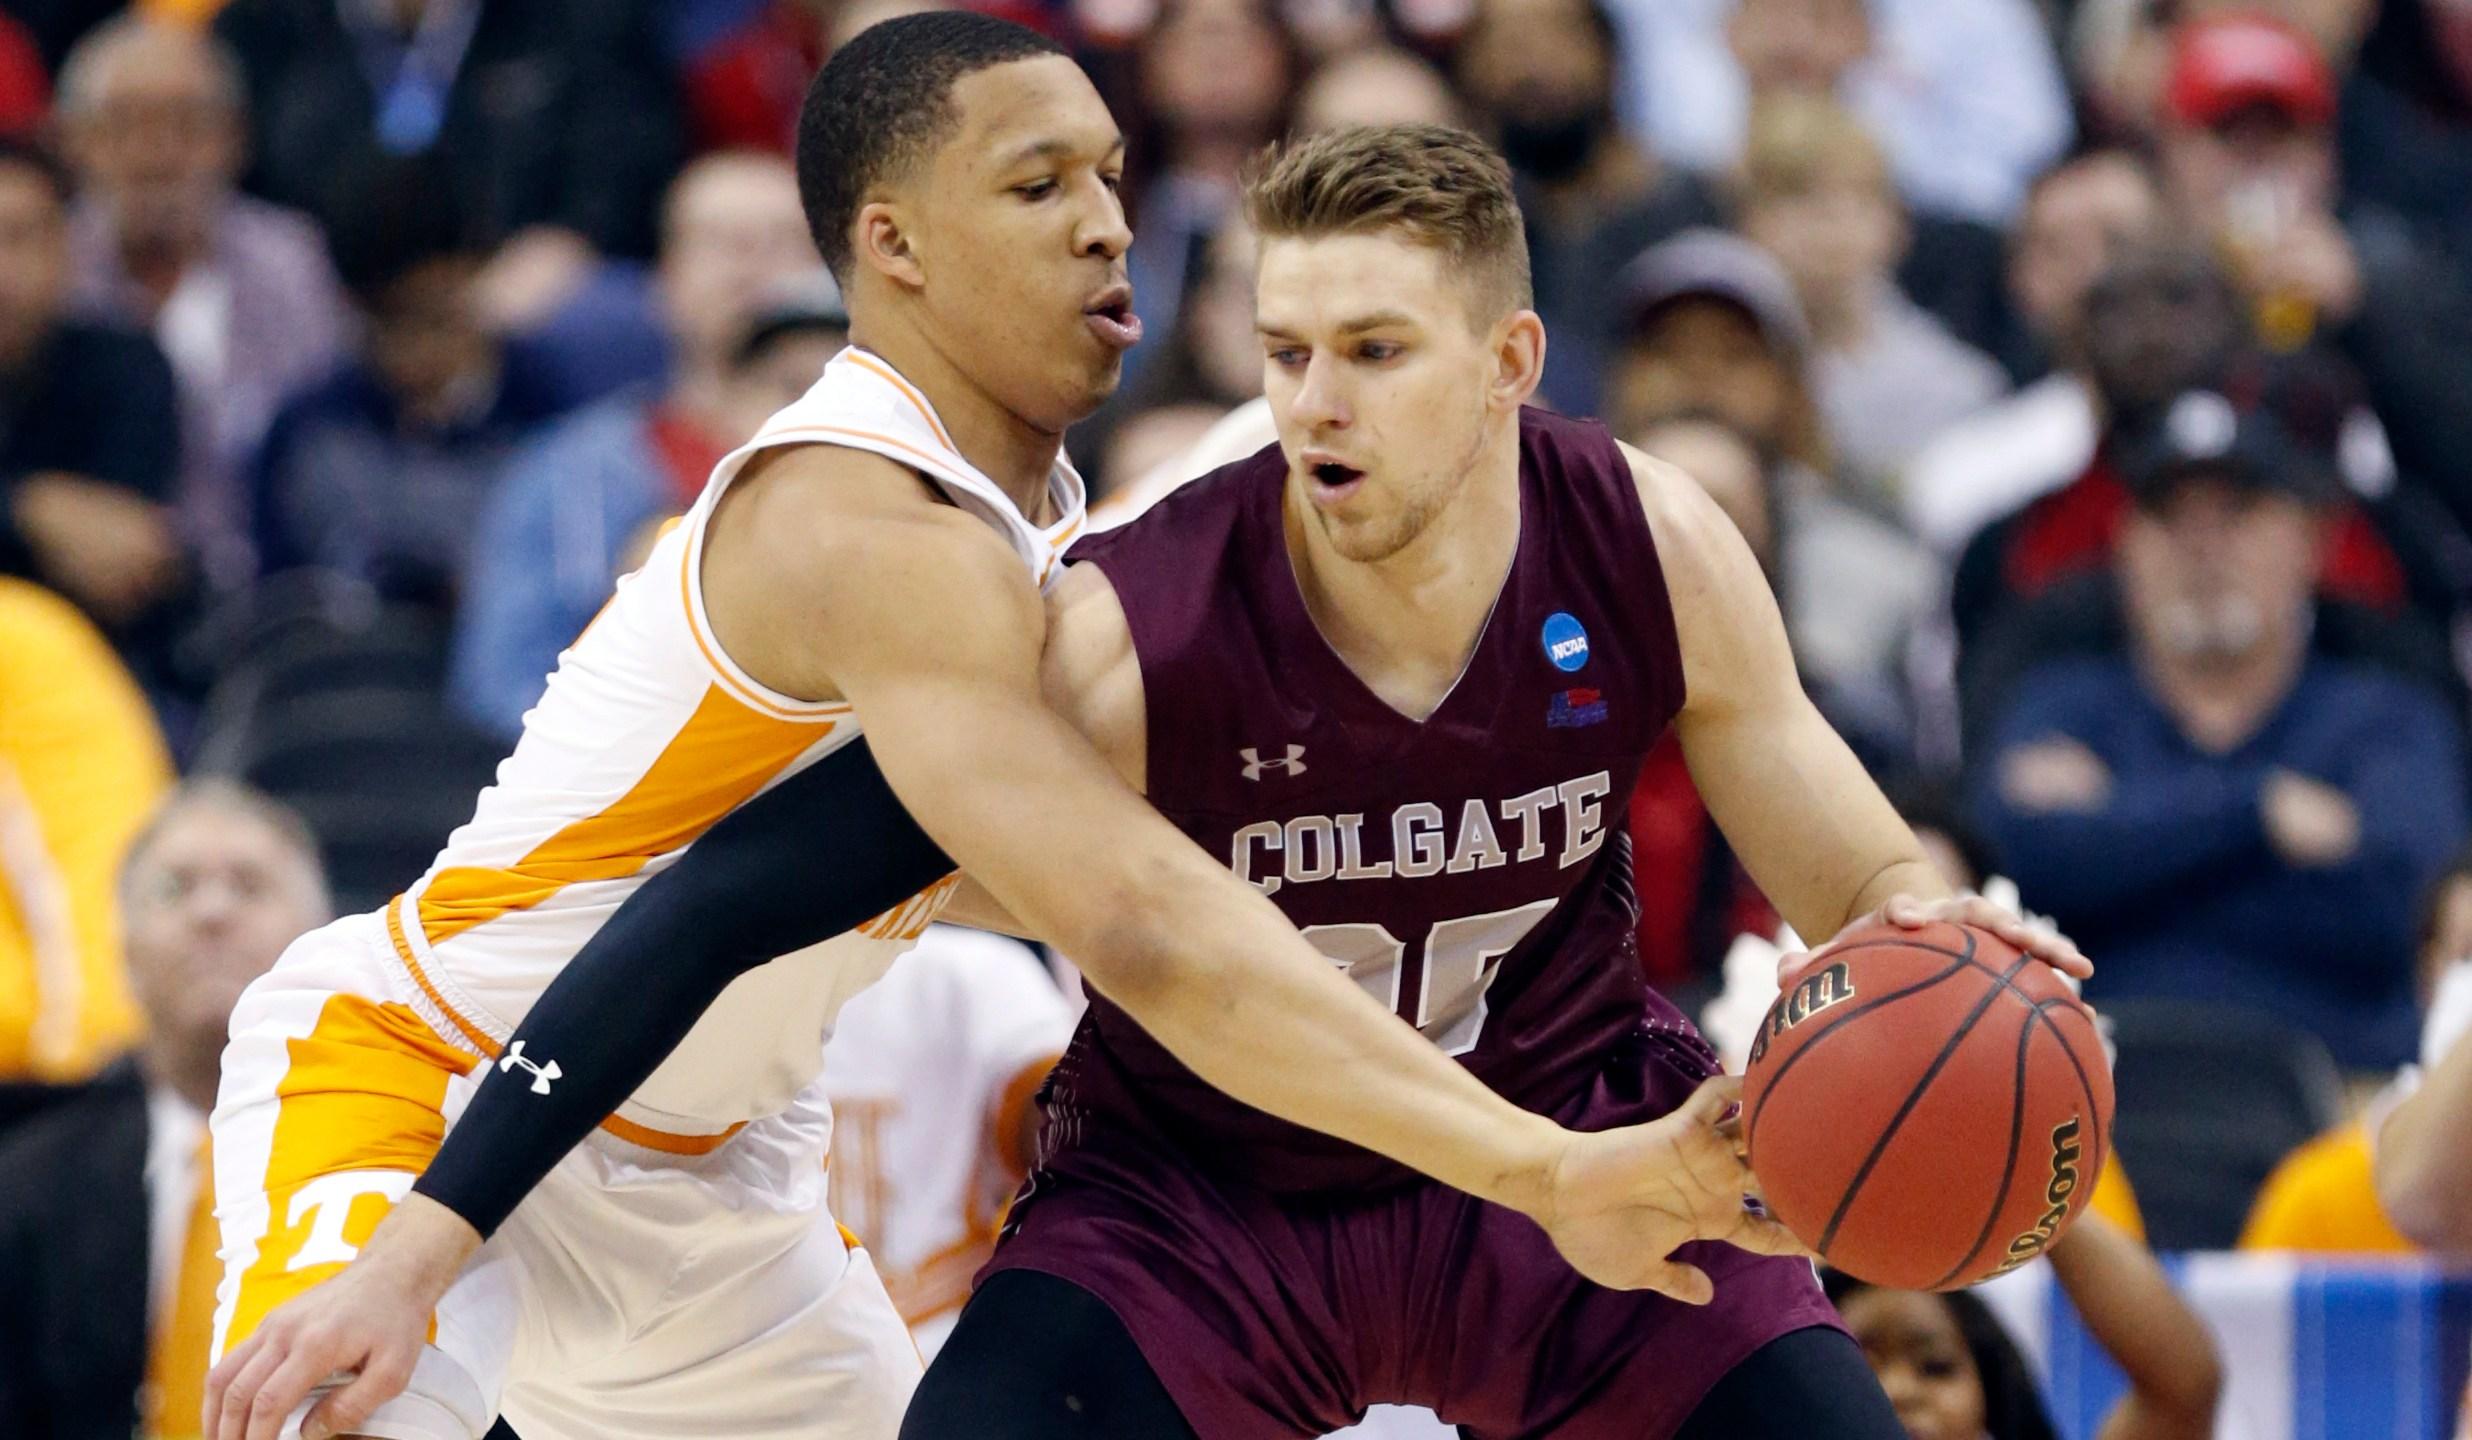 NCAA Colgate Tennessee Basketball_1553291590100